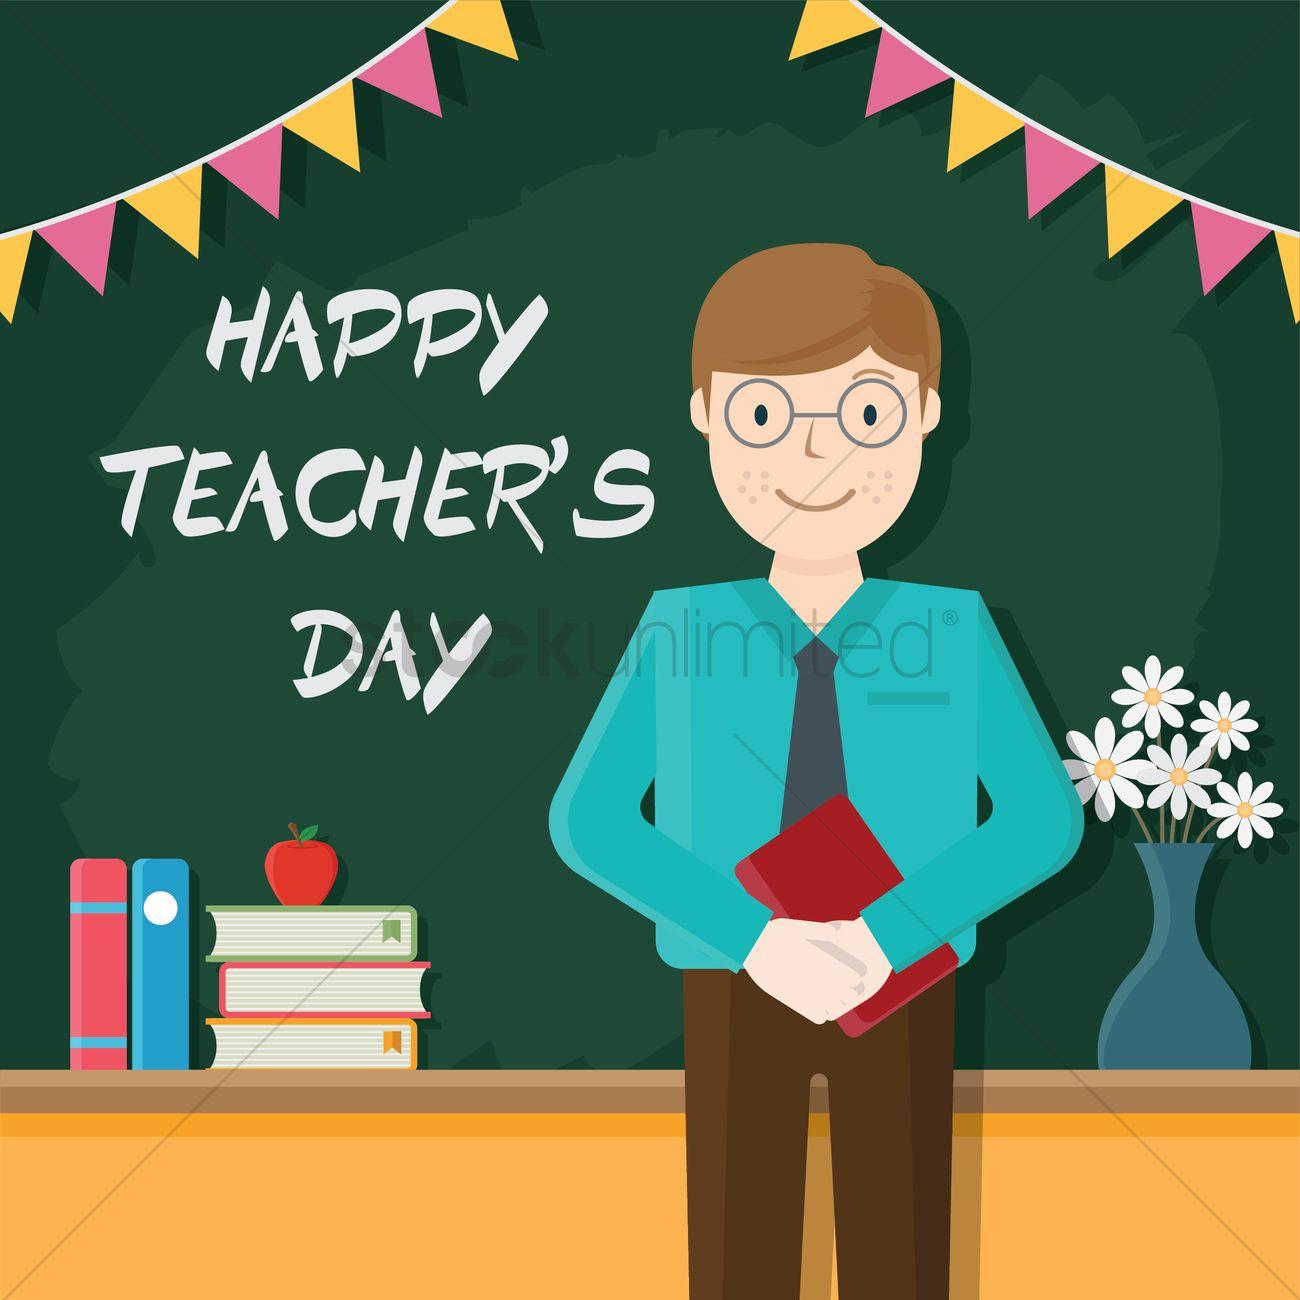 happy teacher s day design vector image 2006988 stockunlimited